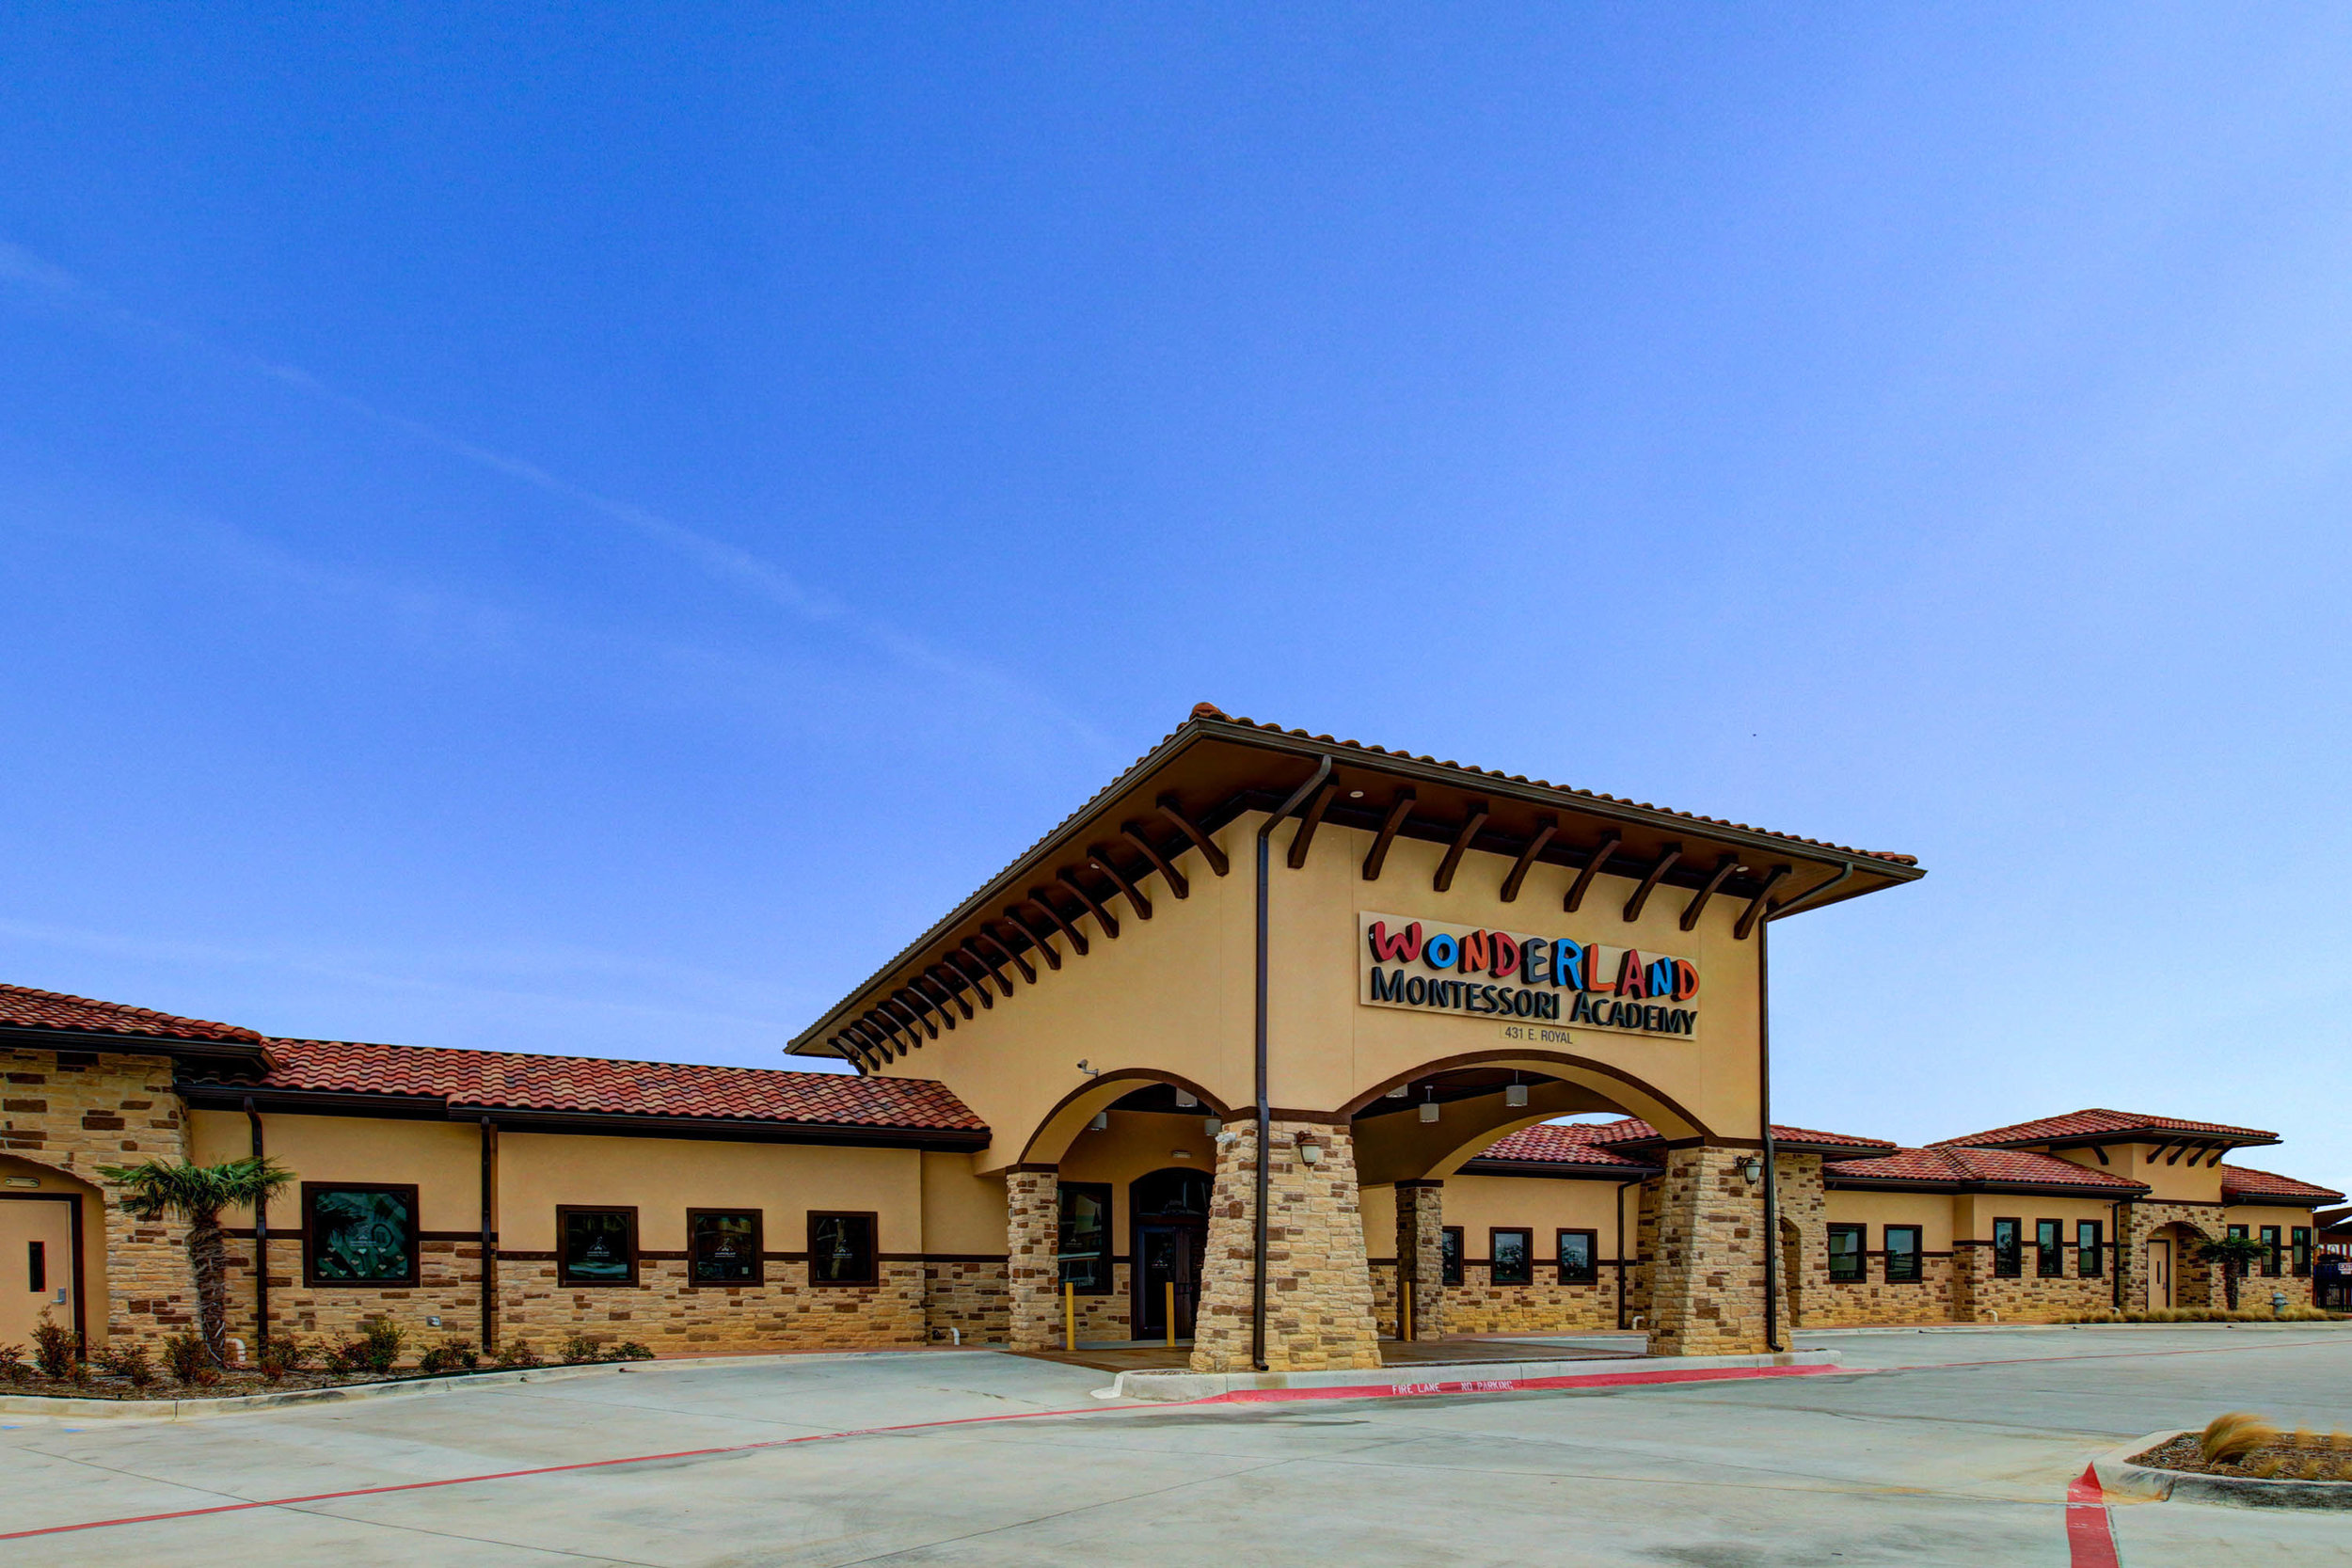 Wonderland Montessori Academy